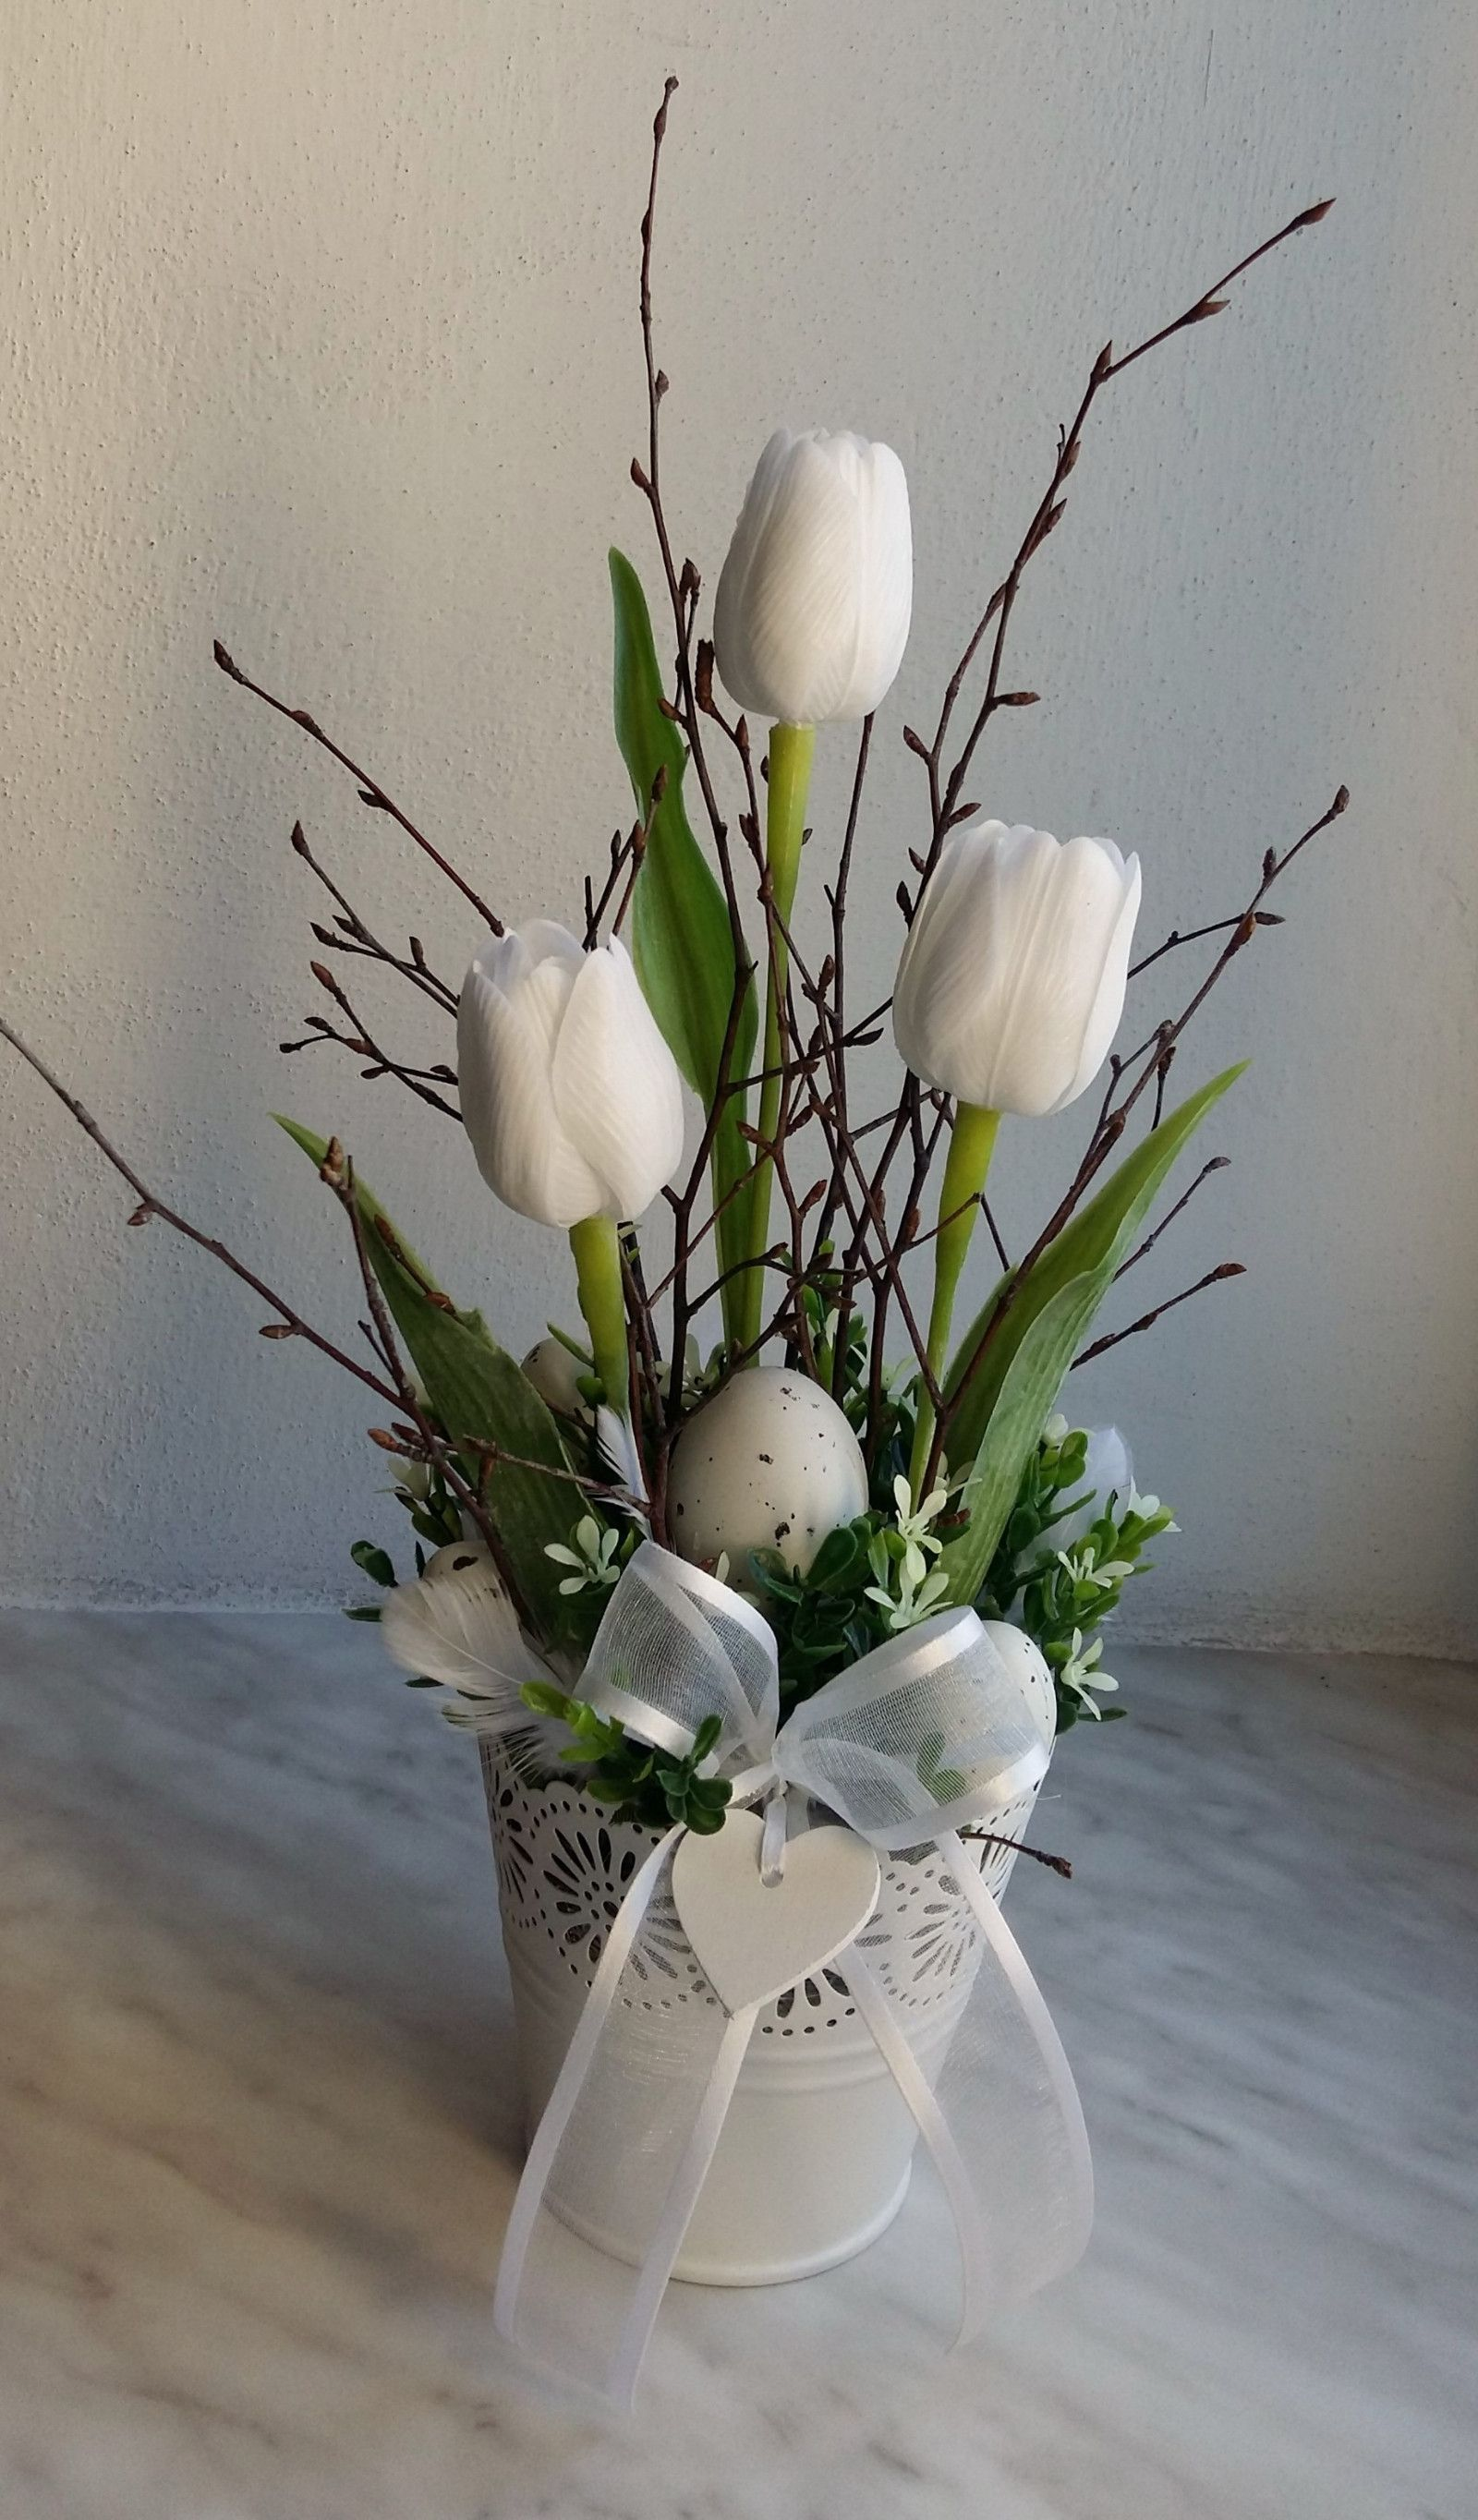 Vysledek Obrazku Pro Stroiki Wielkanocne Na Cmentarz Allegro Easter Flower Arrangements Easter Flowers Easter Arrangement